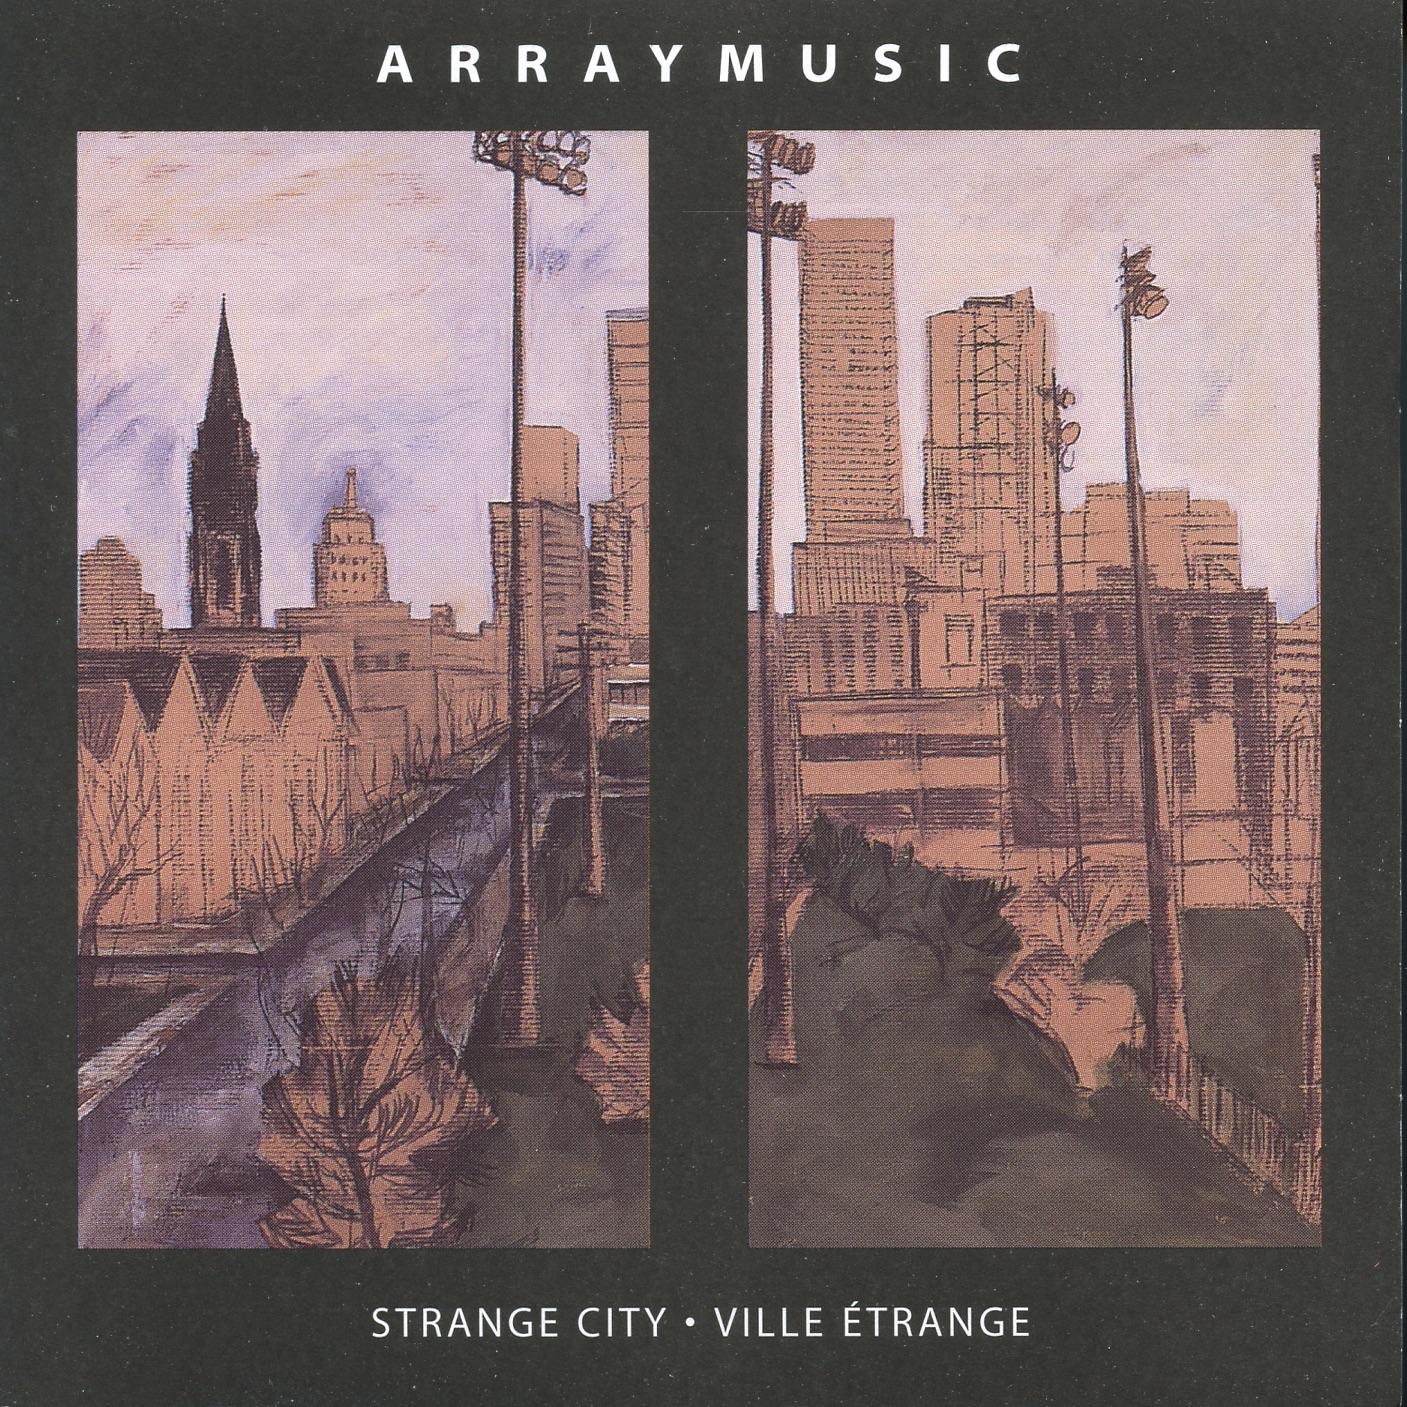 Strange City (Ville étrange)